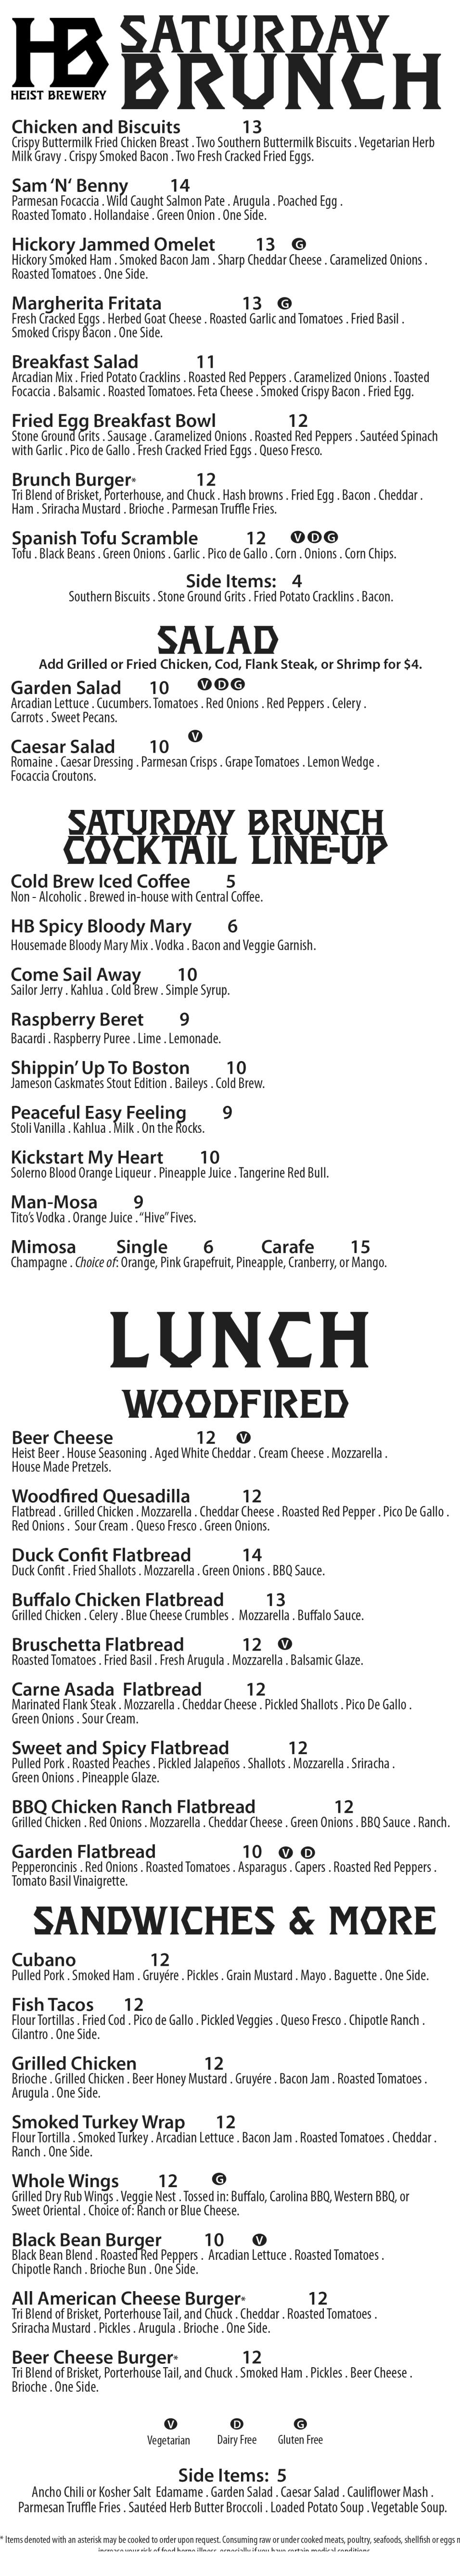 Sat Brunch menu 2-22-18